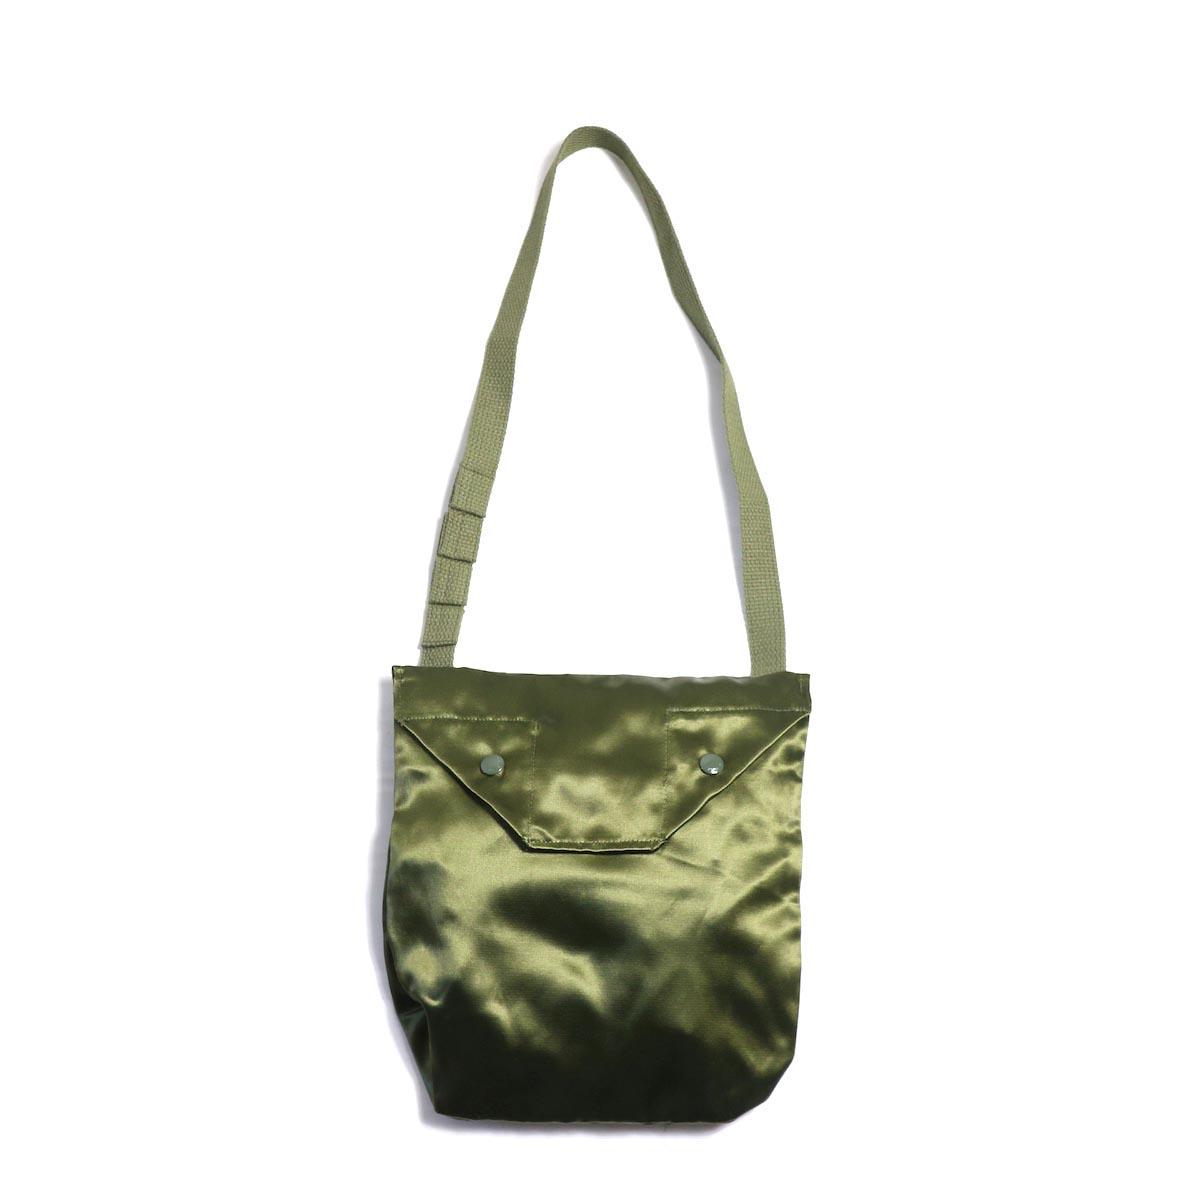 Engineered Garments / Shoulder Pouch - PC Kasha (Olive)